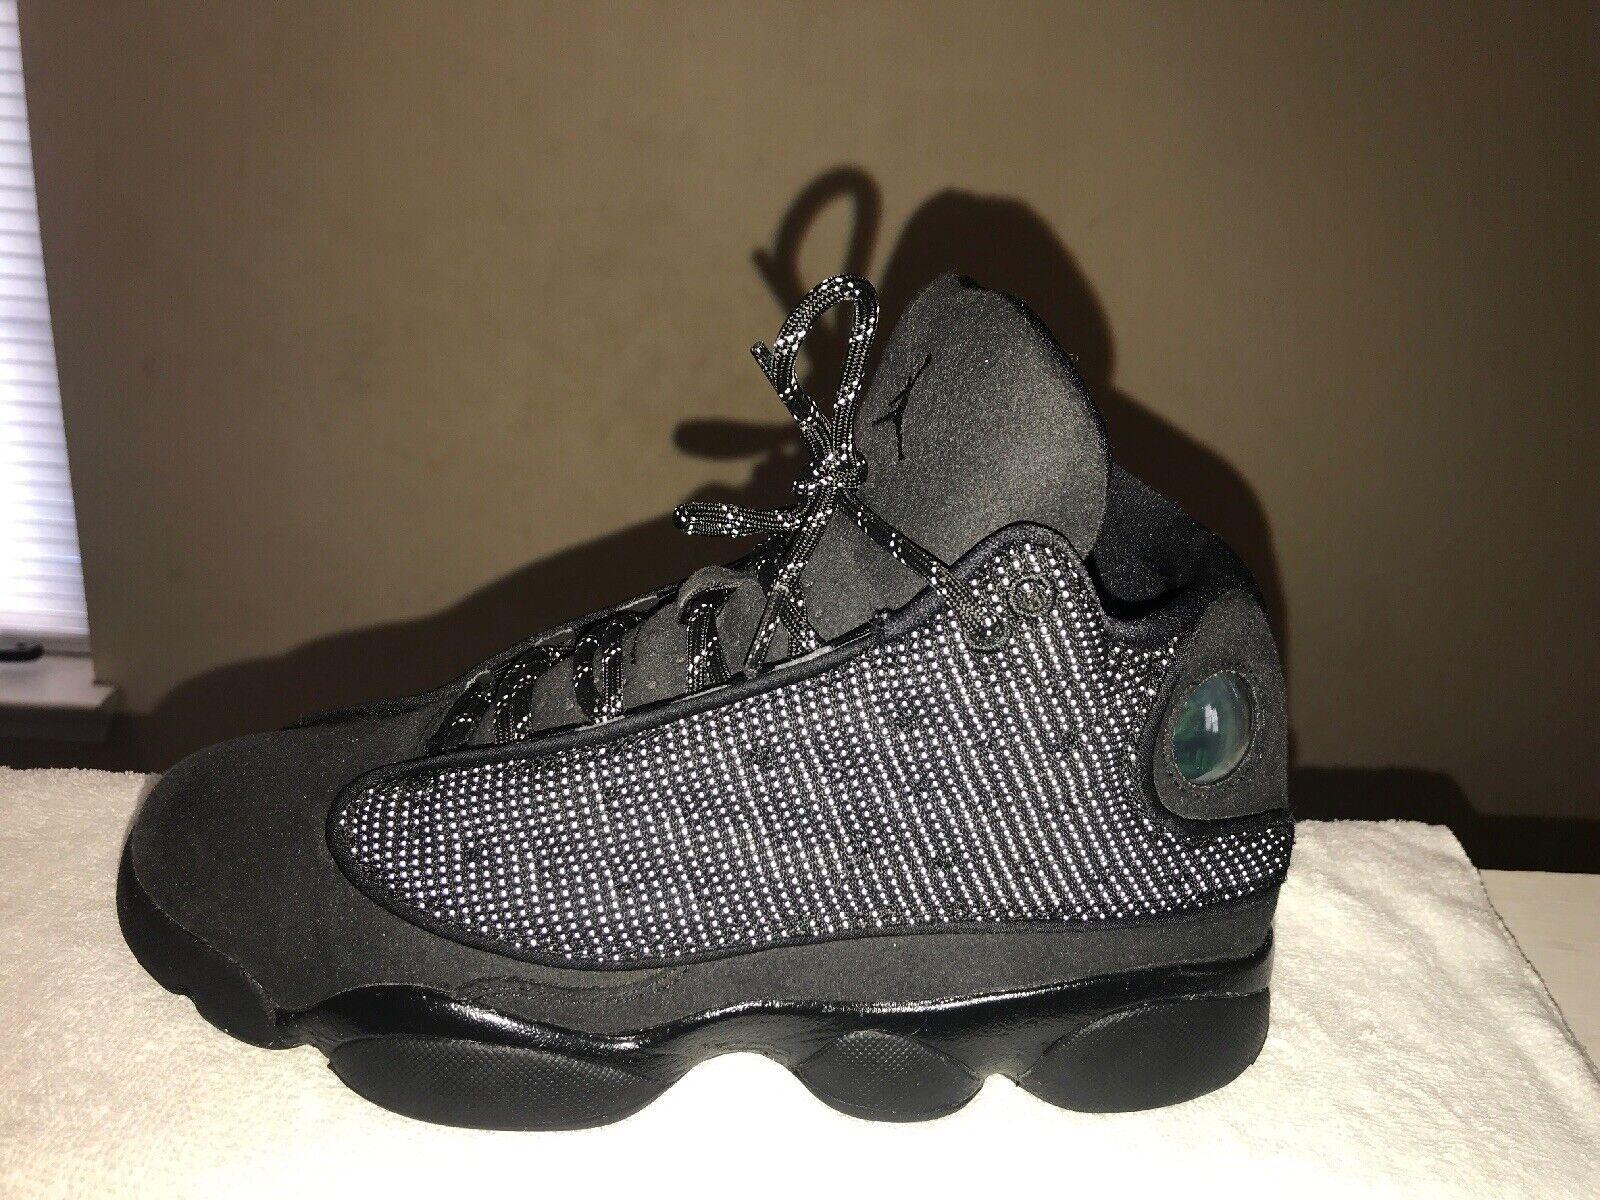 timeless design 3703a b8f3a Nike Nike Nike Air Jordan XIII Retro Black Cat Anthracite Sz - 6.5youth  f7614d